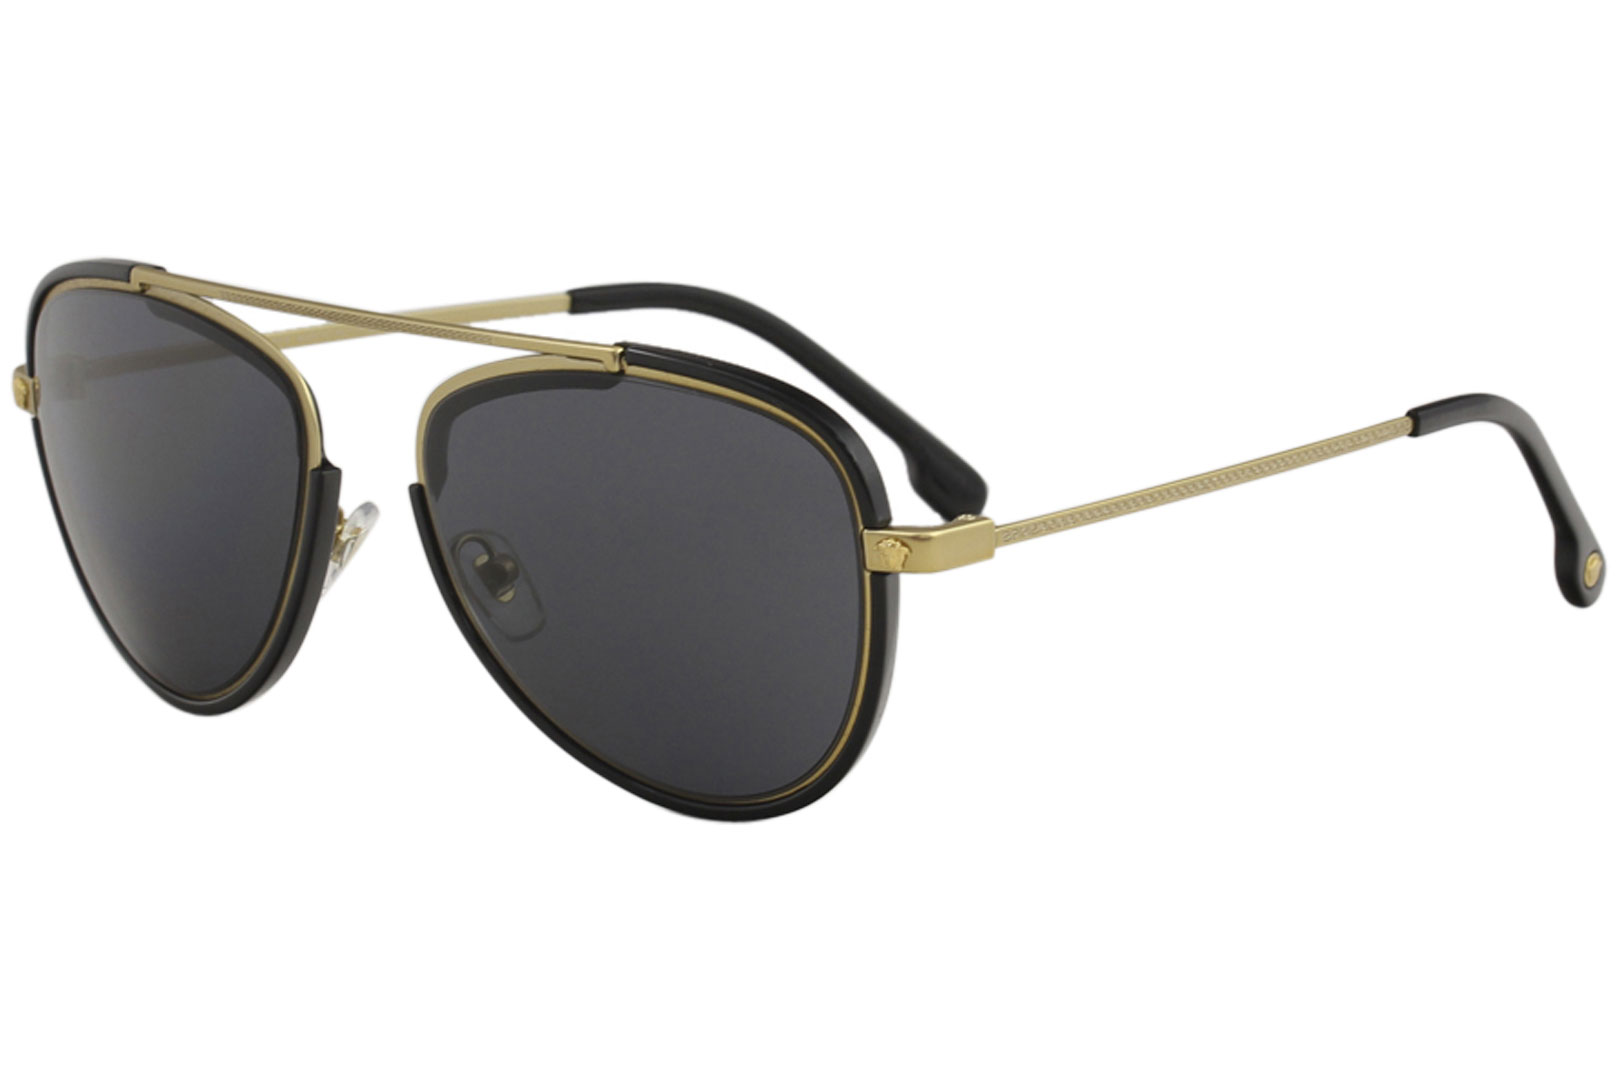 Versace Men s VE2193 VE 2193 1428 87 Tribute Gold Black Pilot ... c5d11cb755